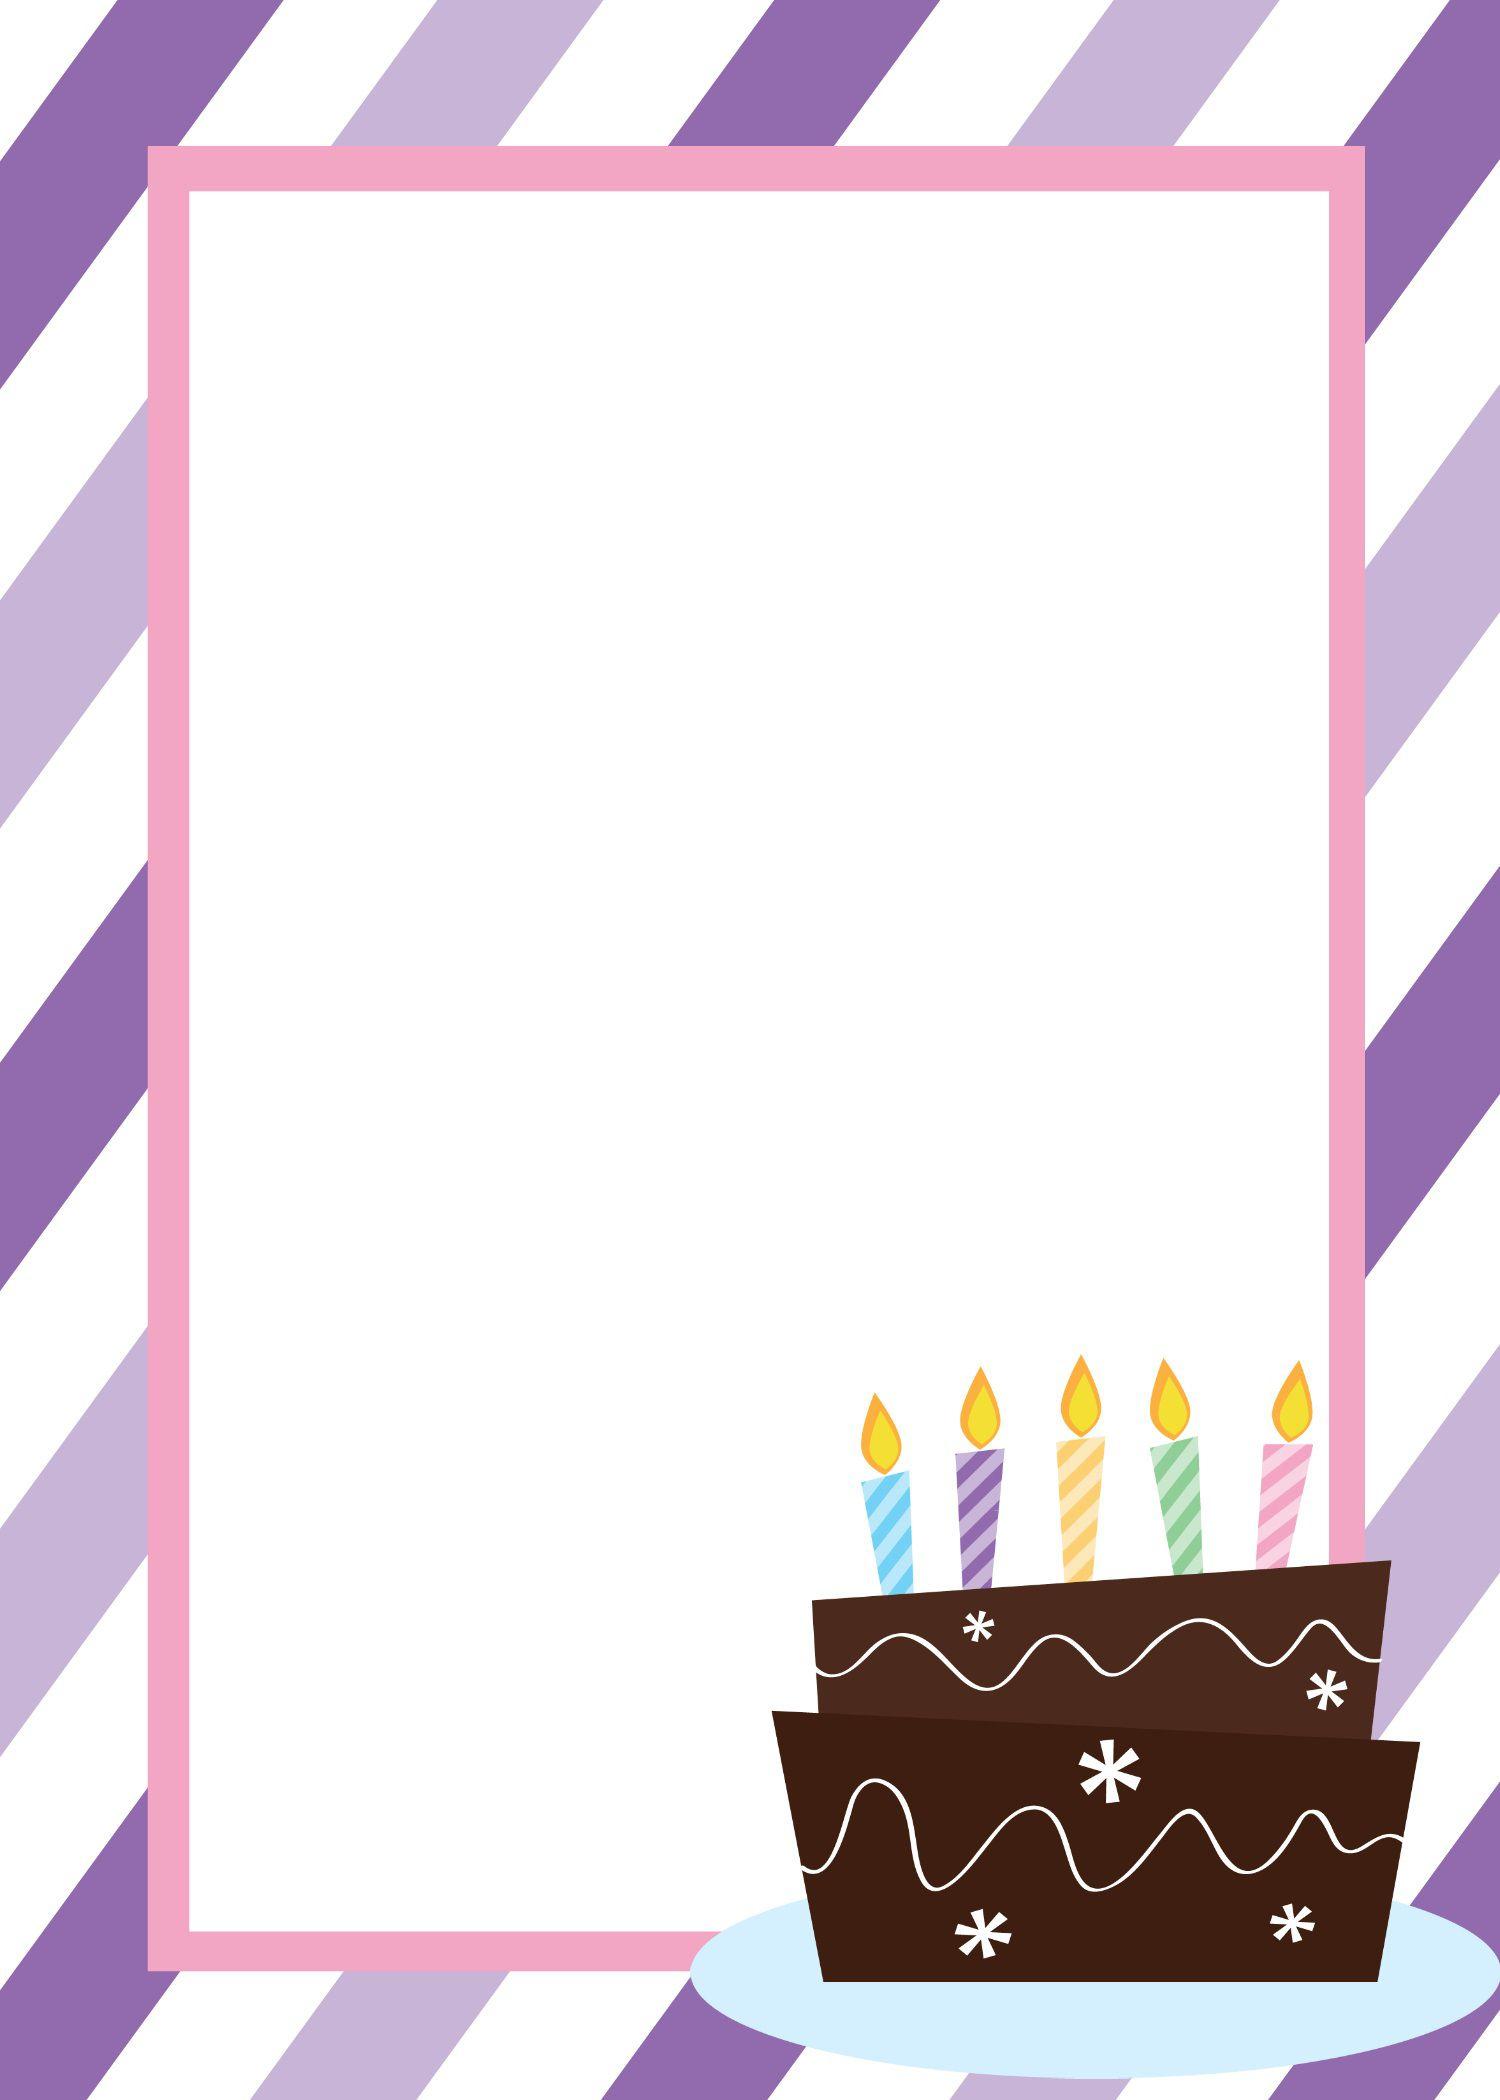 003 Magnificent Free Birthday Party Invitation Template Sample  Templates Printable 16th Australia UkFull